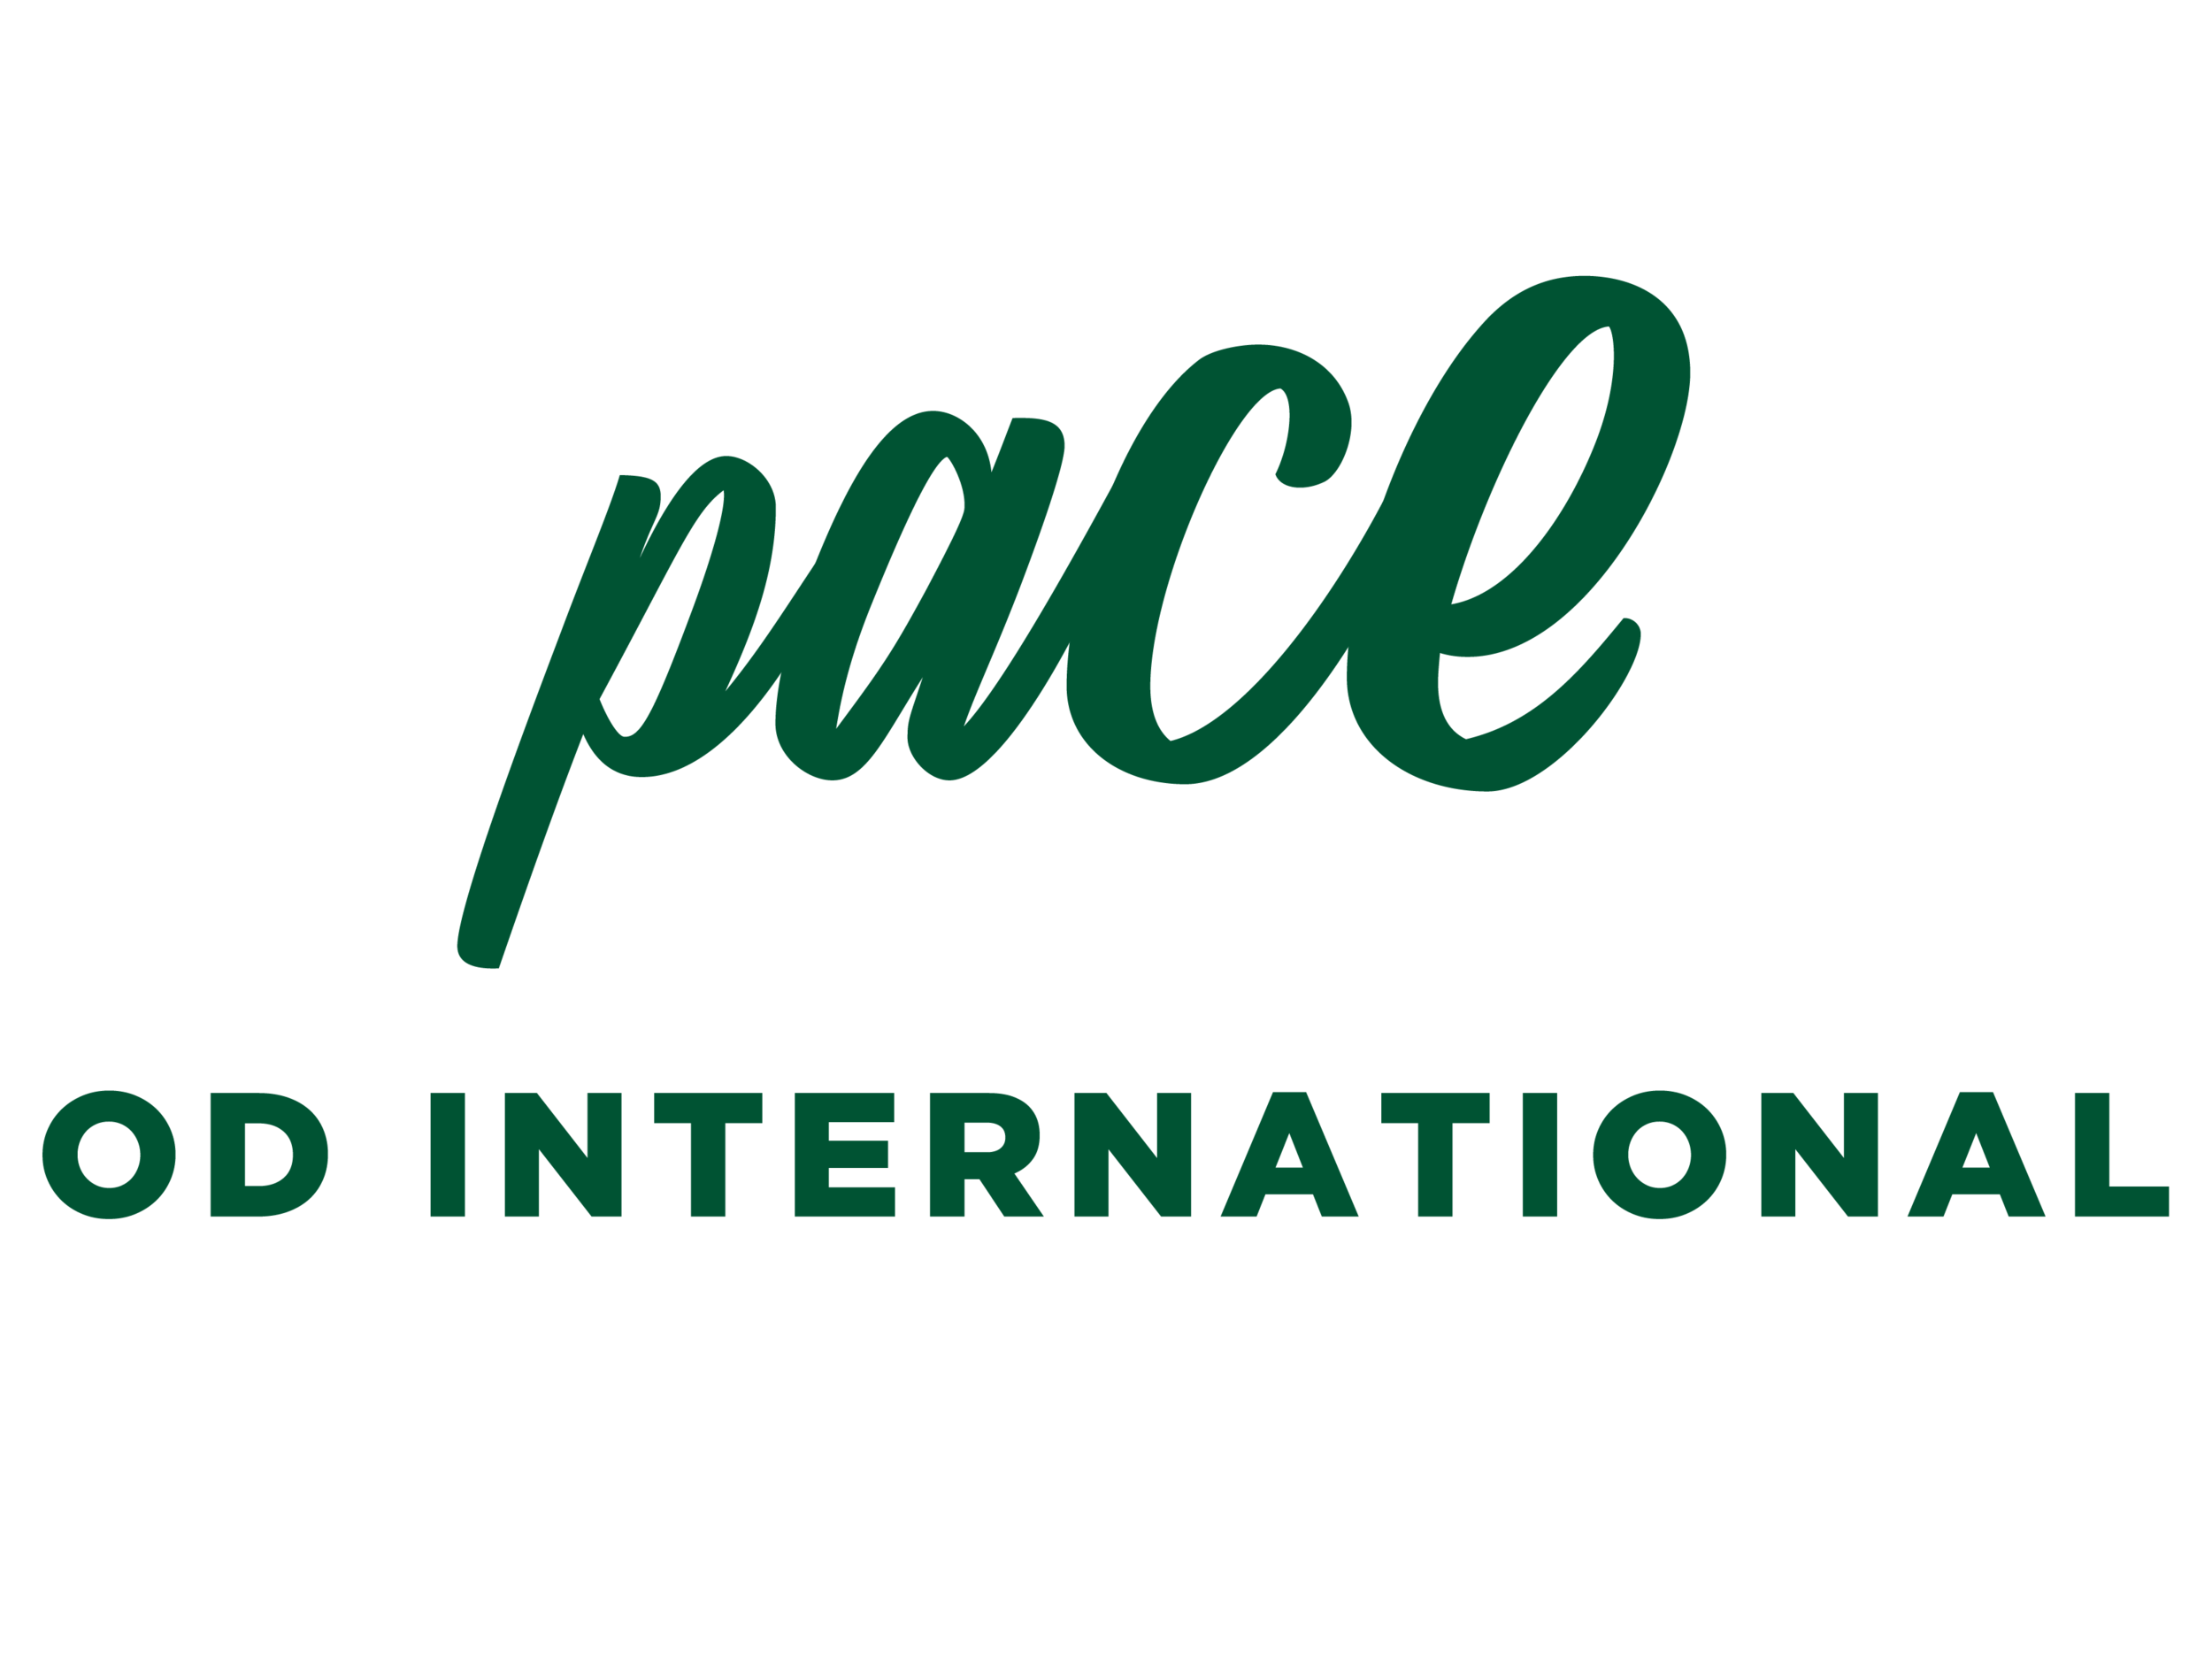 Pace 2019_ODI_Colour-01.png